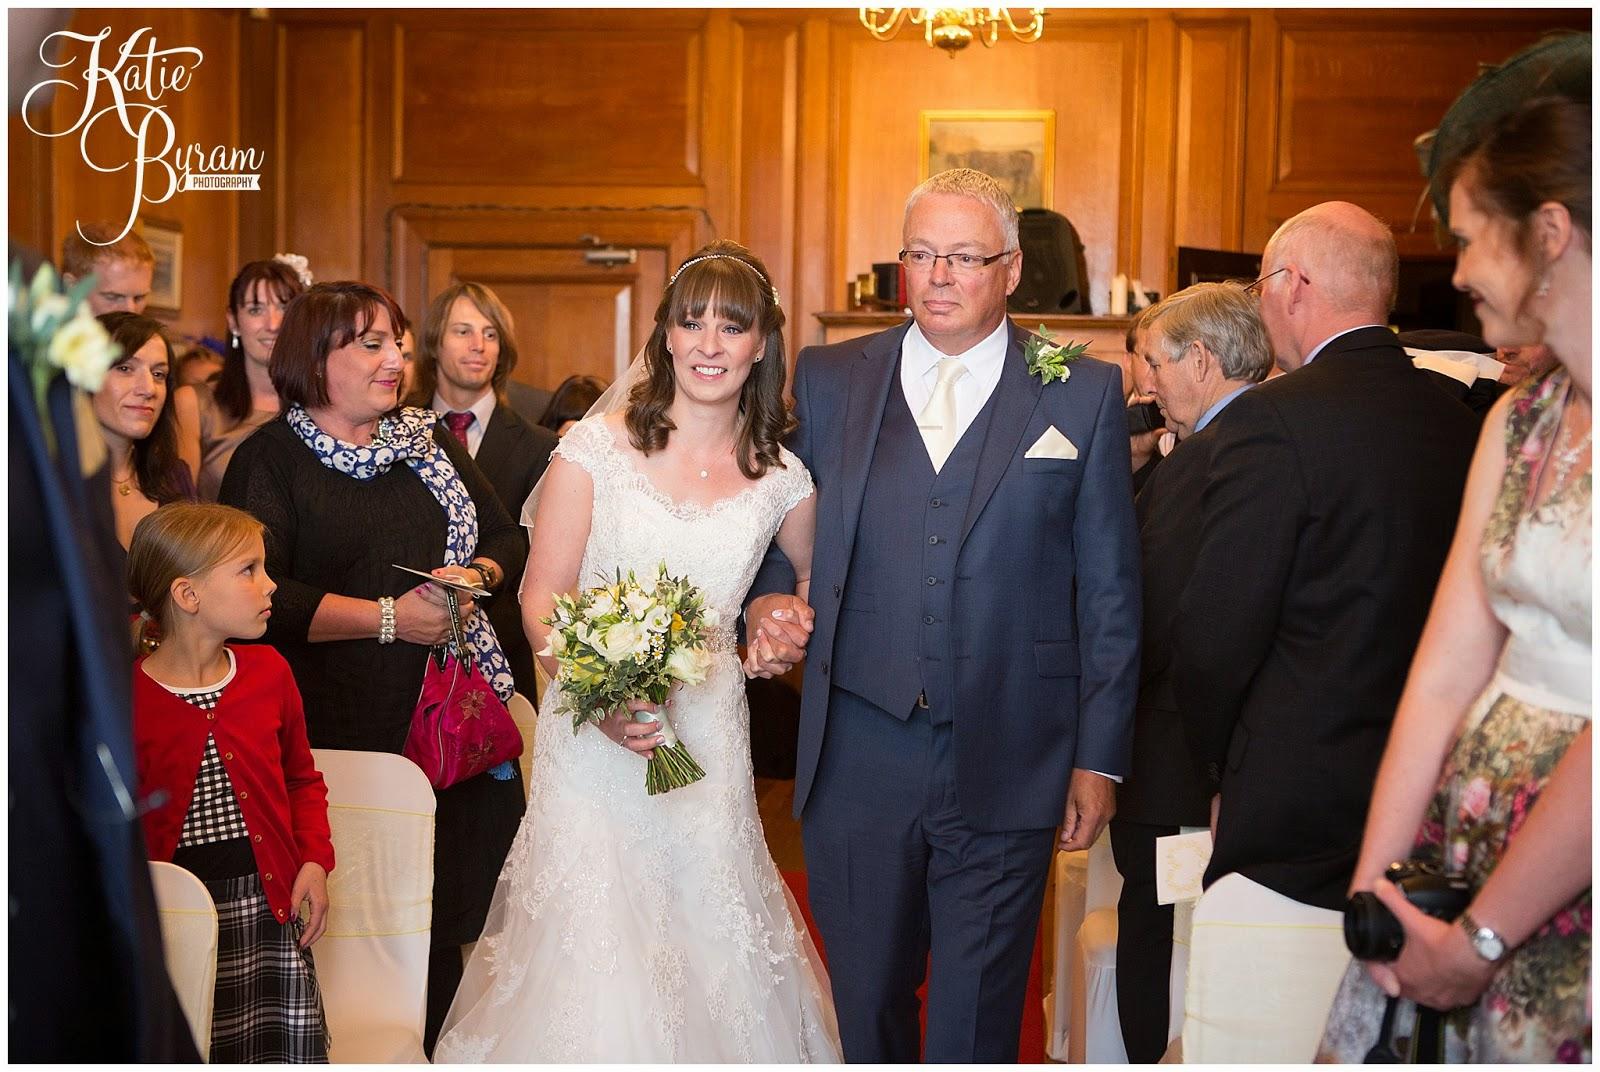 kirkley hall wedding, share the honest love, love my dress blog, katie byram photography